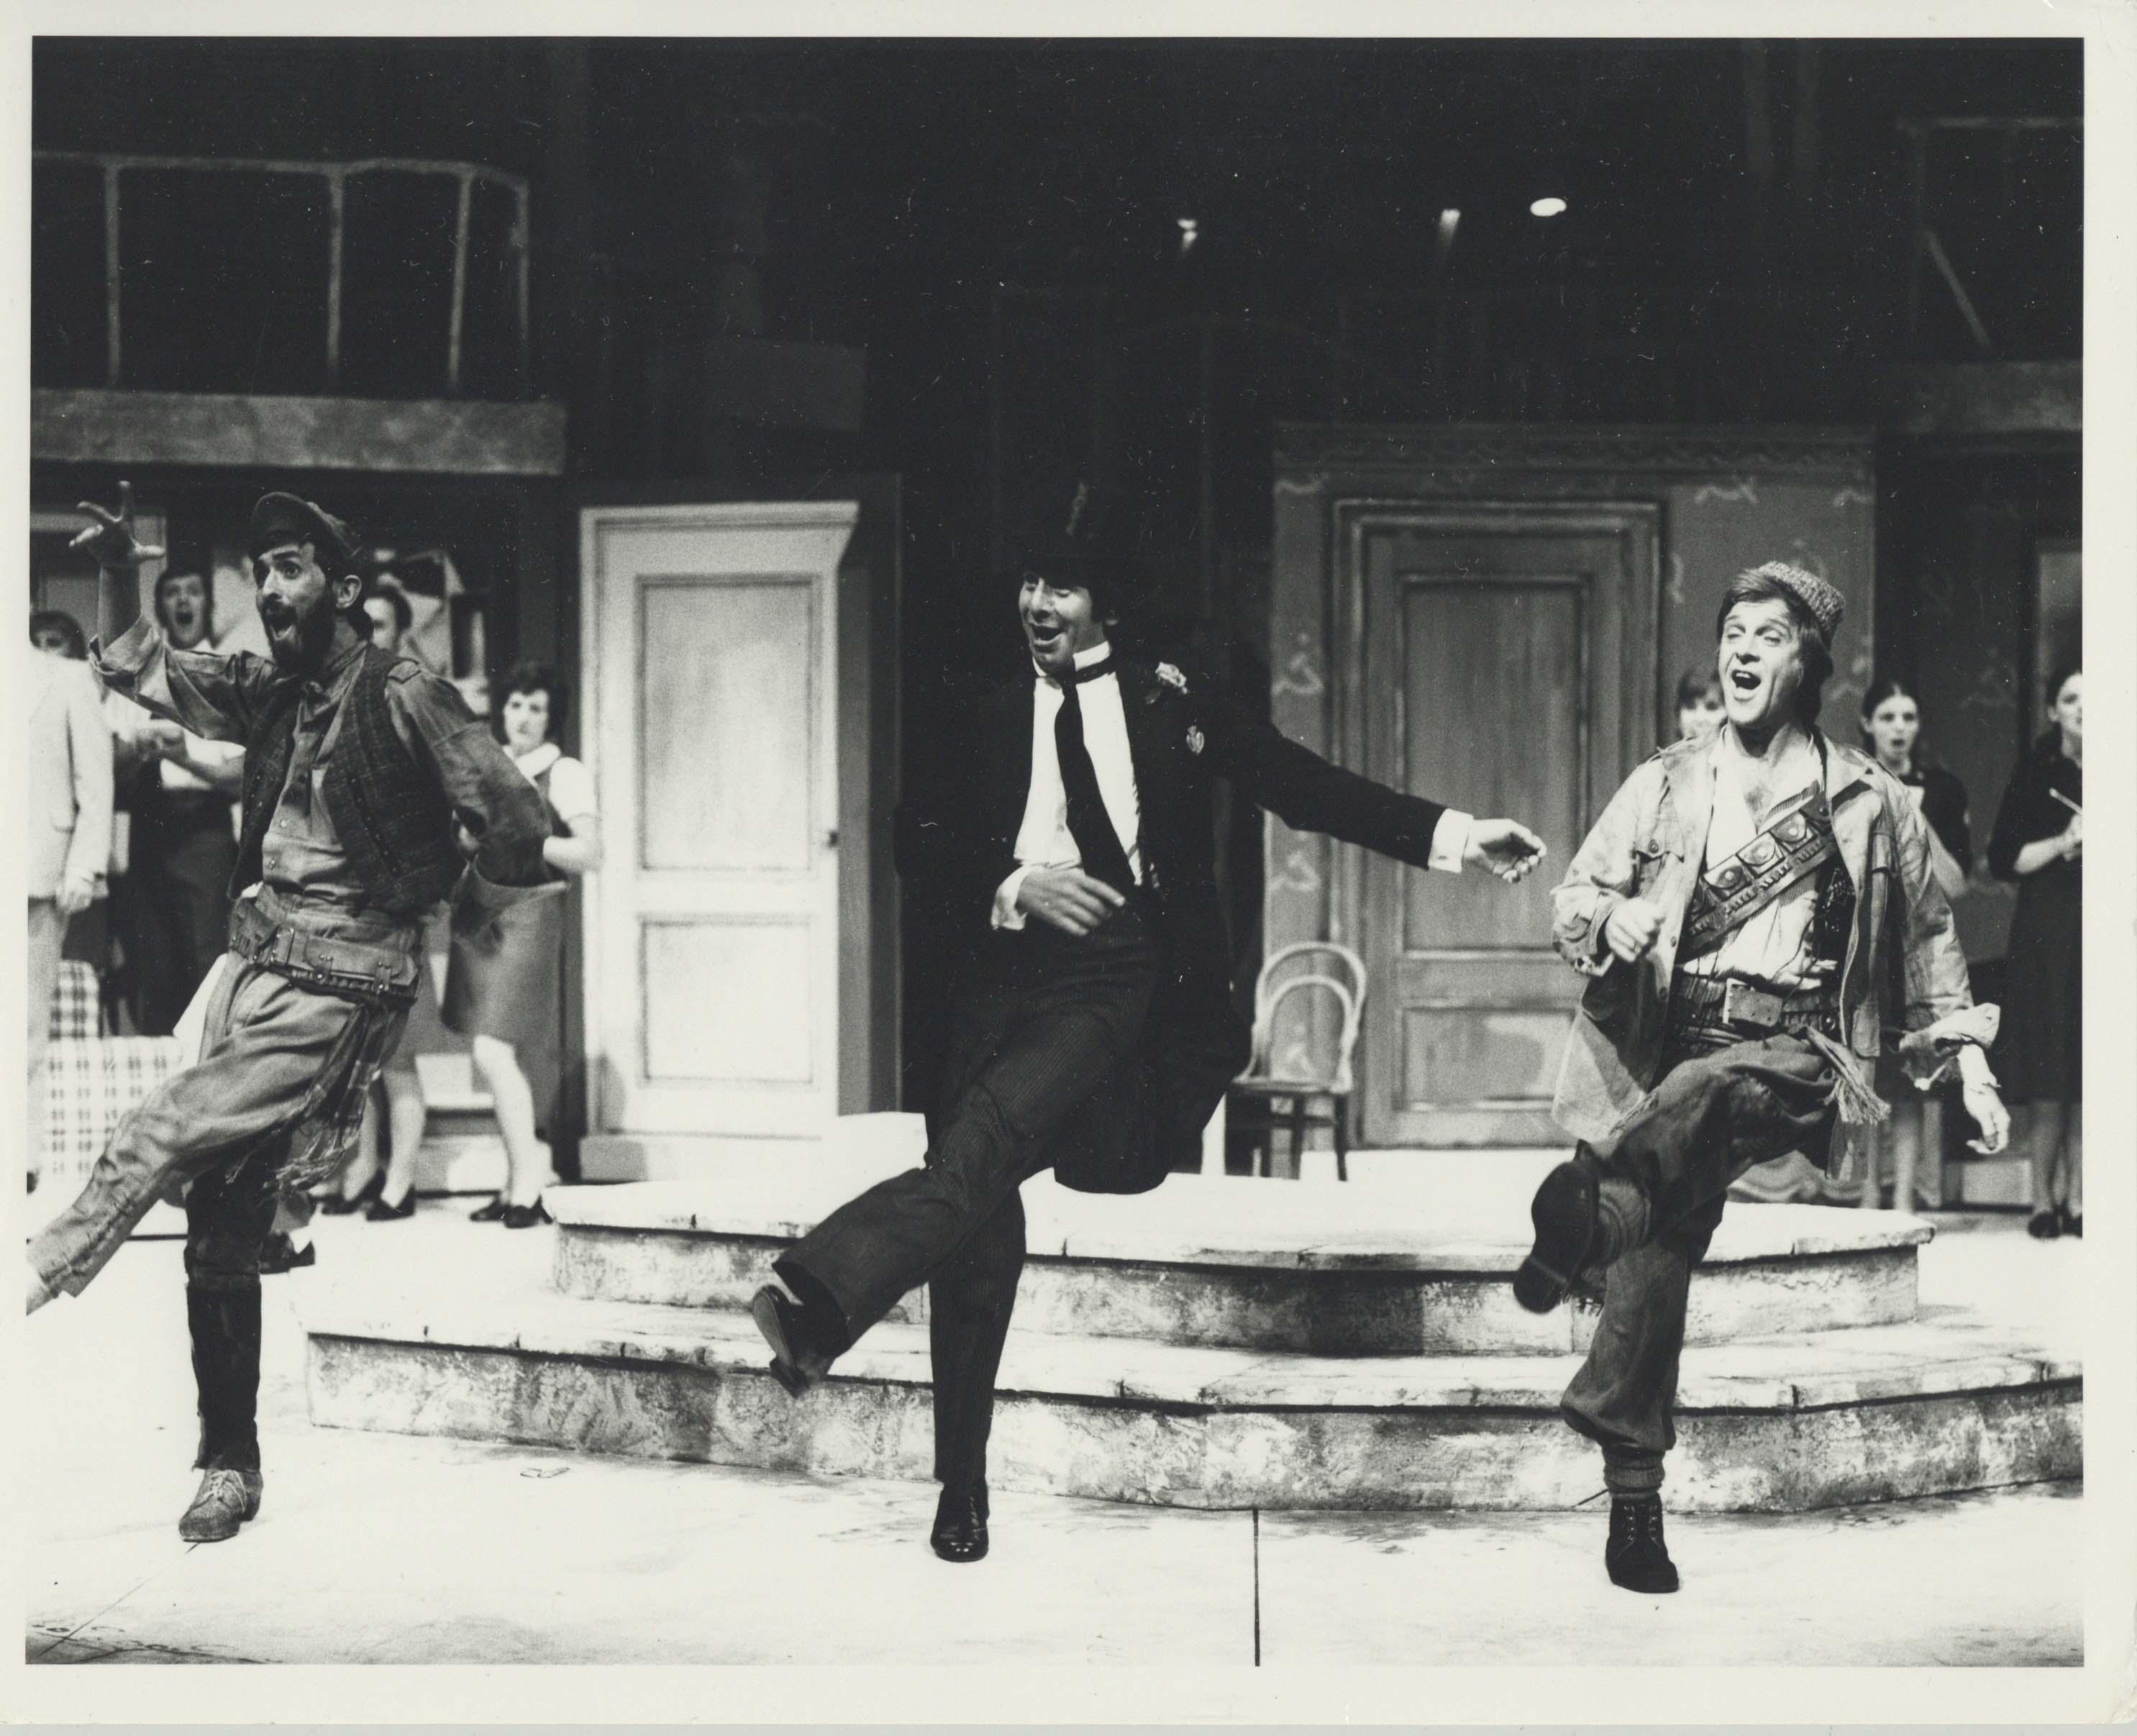 Production Photograph - R loves J - Photographer John Timbers - 1973 H21cm W25.5cm 1 of 2